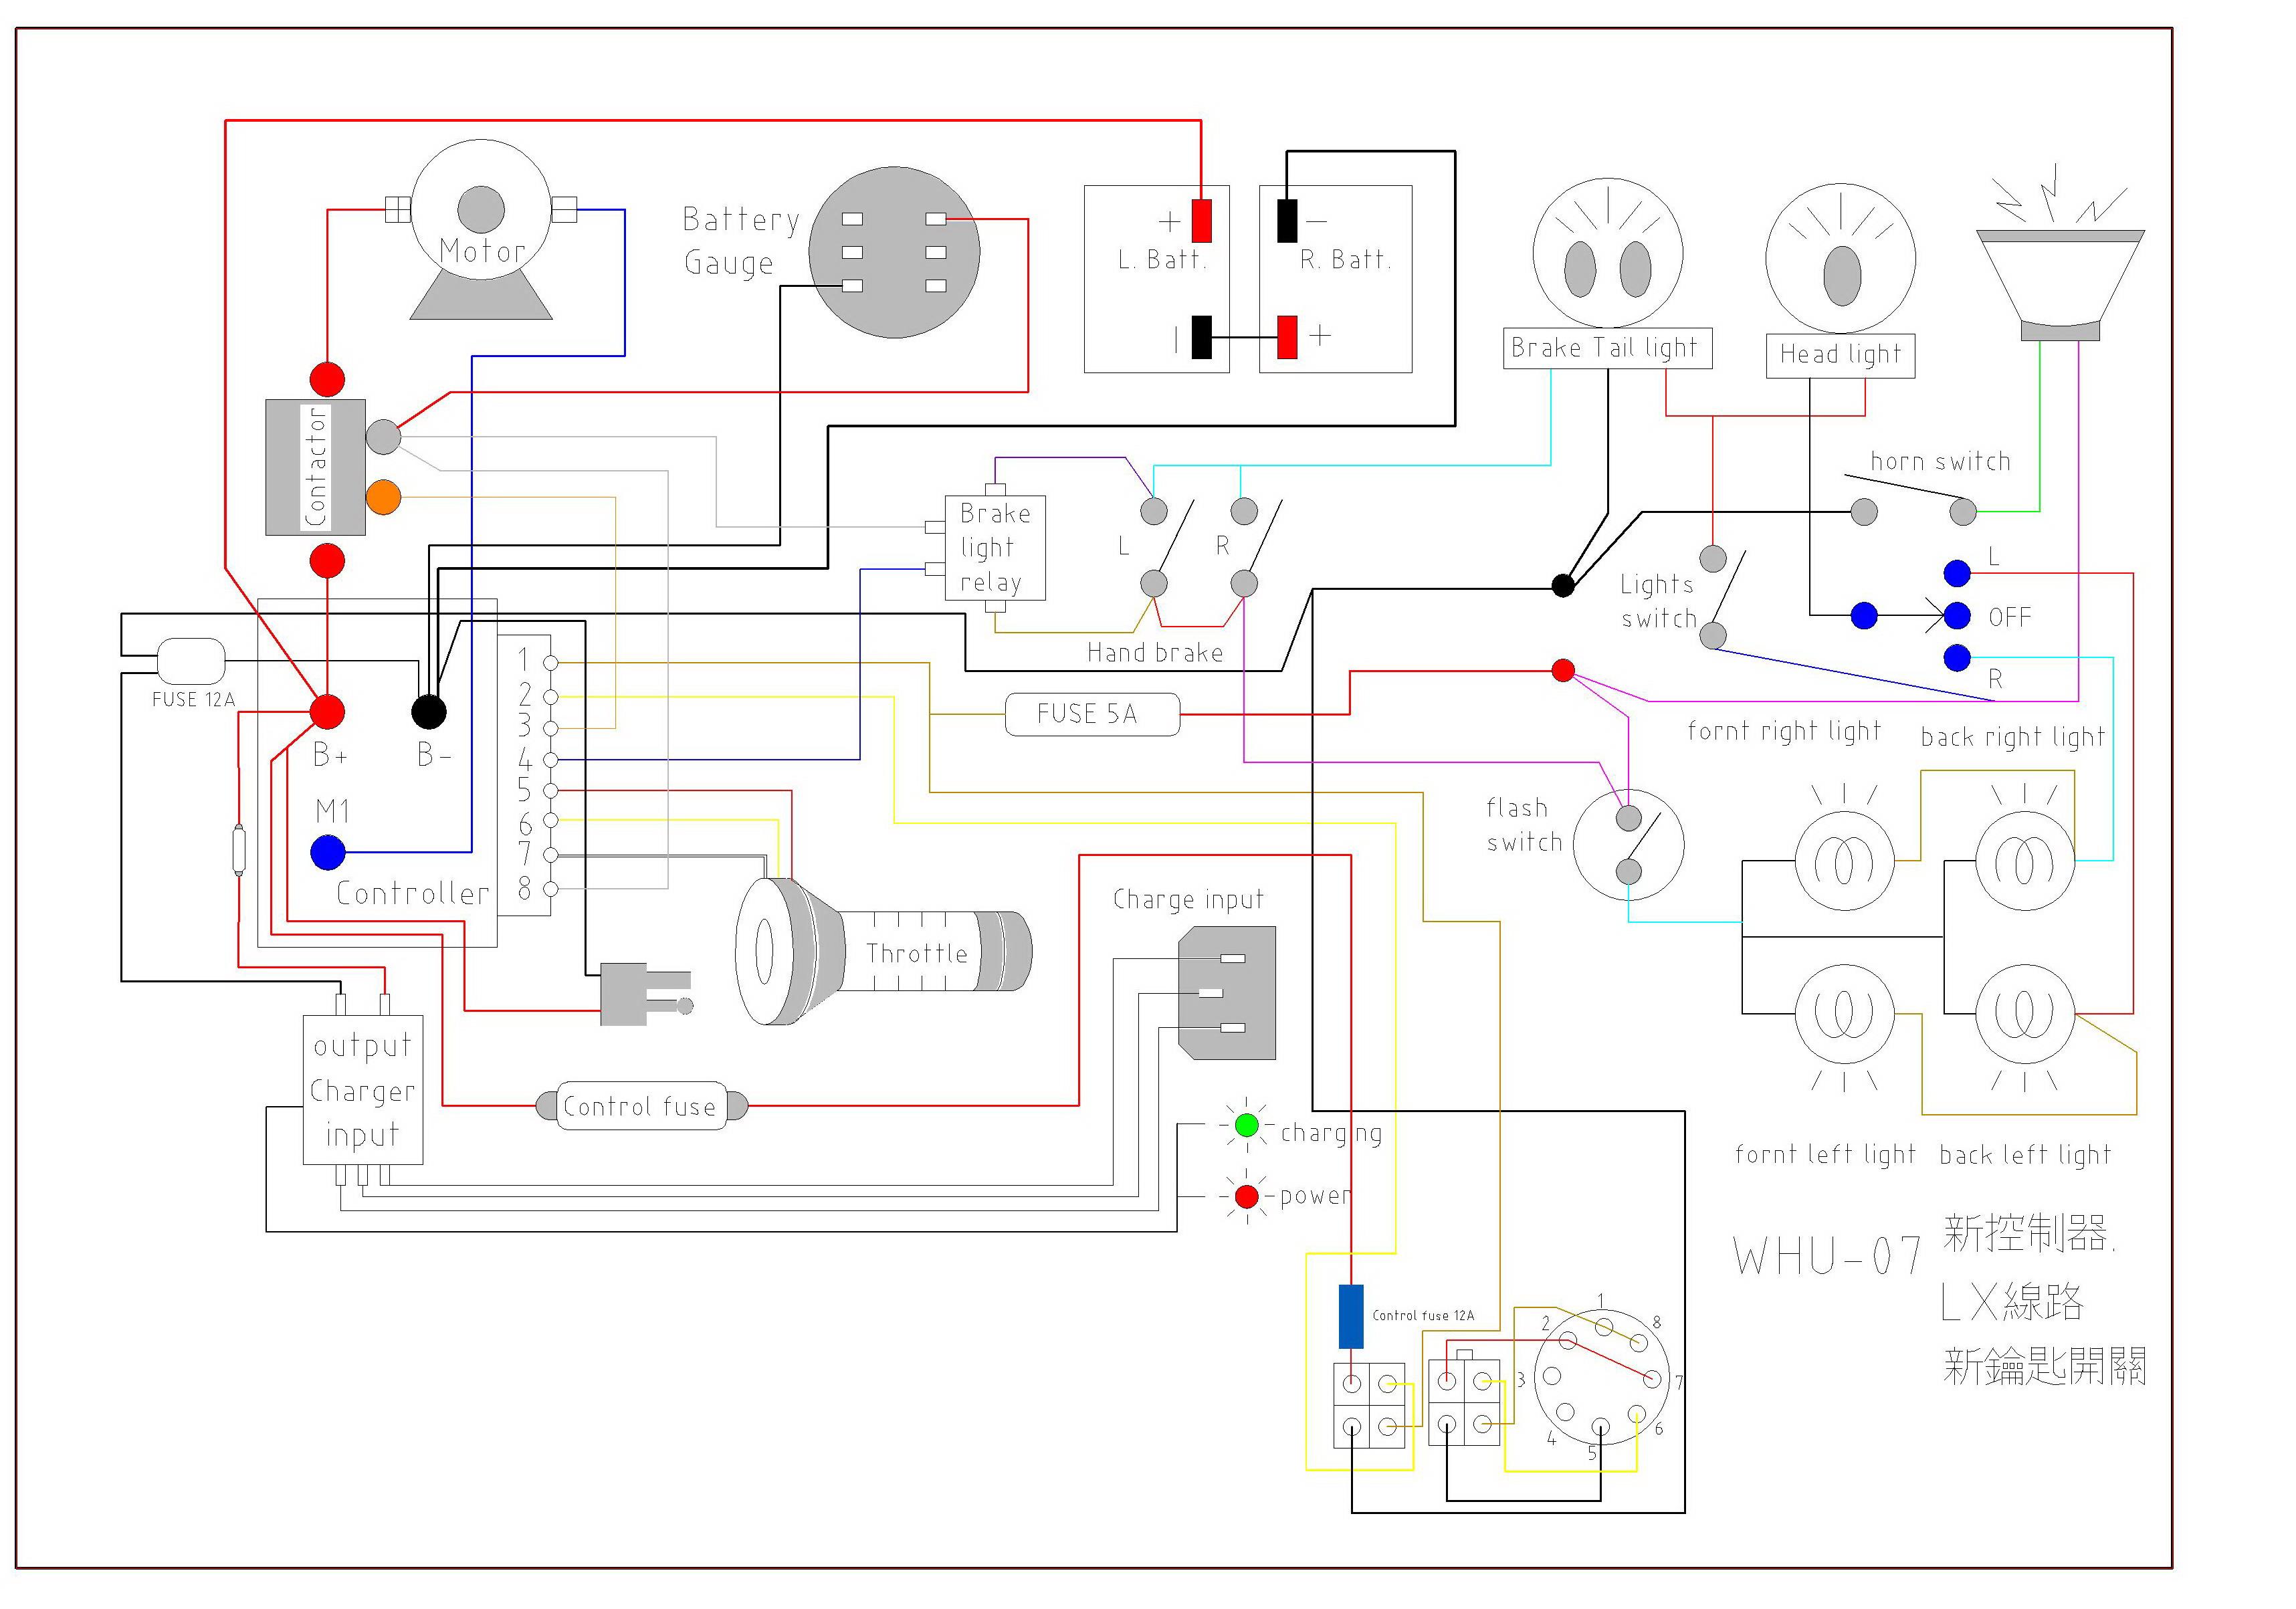 Wiring Ego Schematic Lm2000s - Wiring Diagram Database on